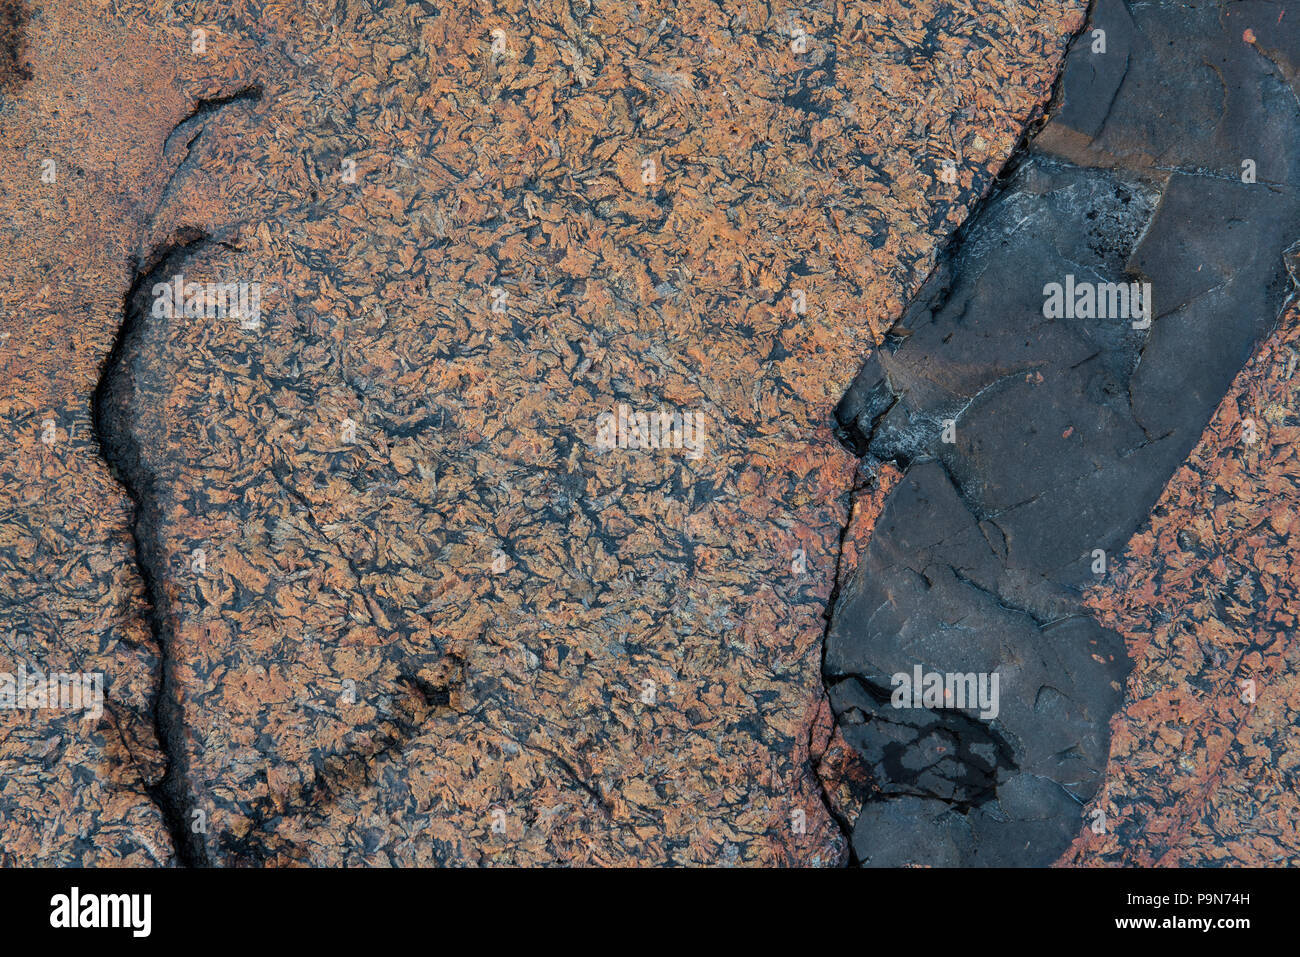 Diabase dike intrusion, rock along Lake Superior, Neys Provincial Park, Ontario, Canada, by Bruce Montagne/Dembinsky Photo Assoc - Stock Image